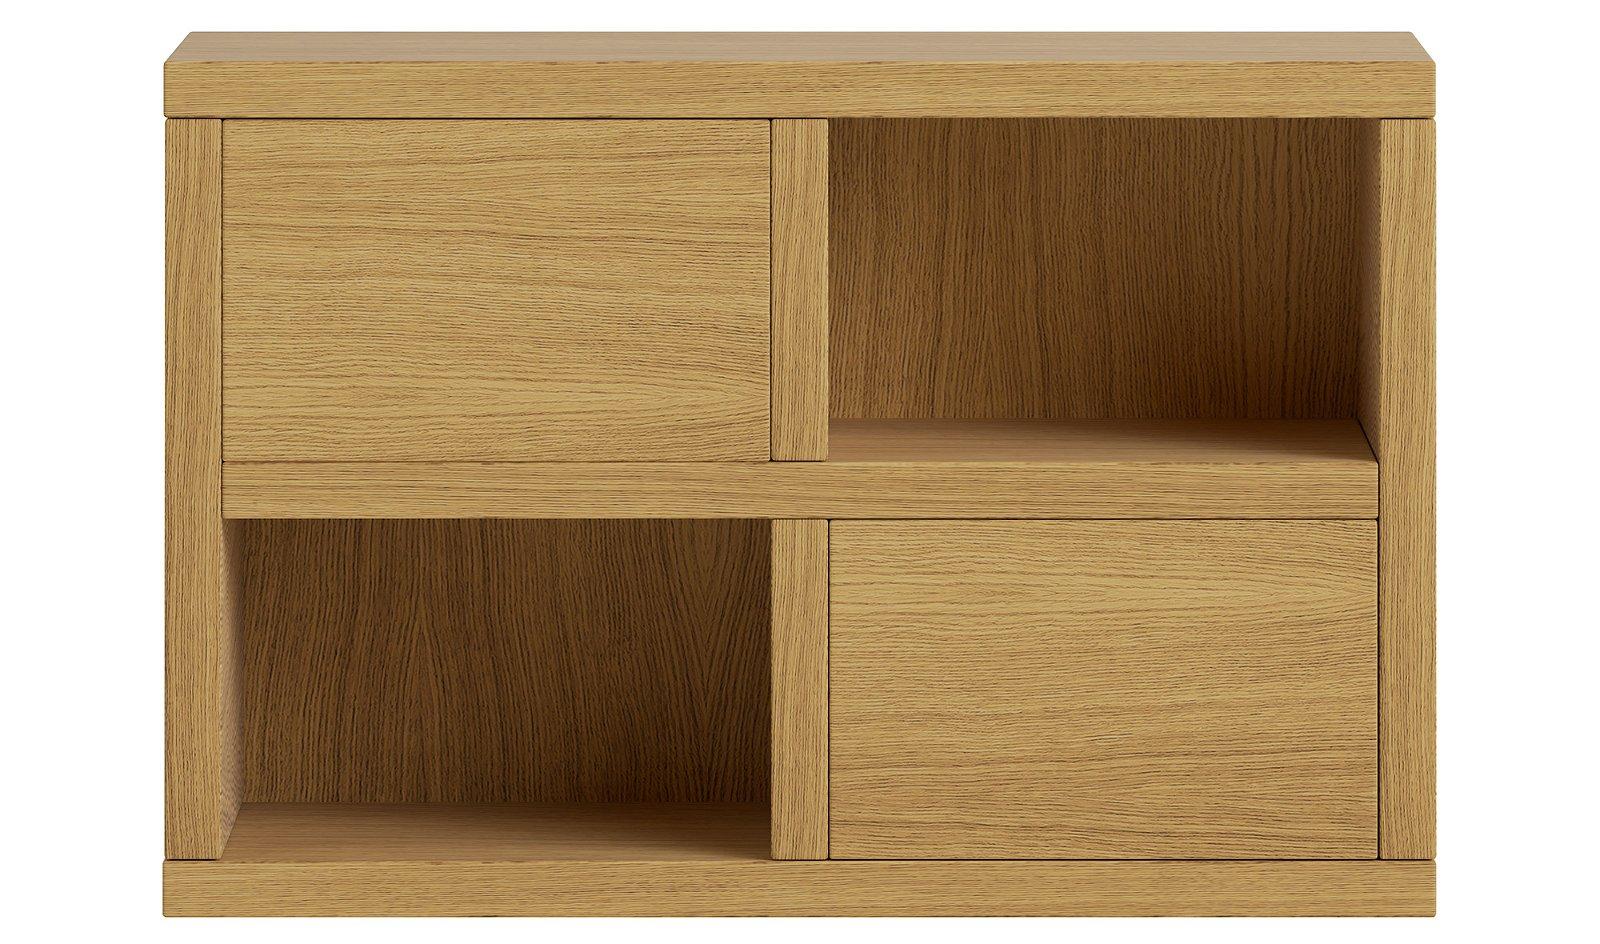 Mueble auxiliar pequeño 2 puertas nórdico Sendai